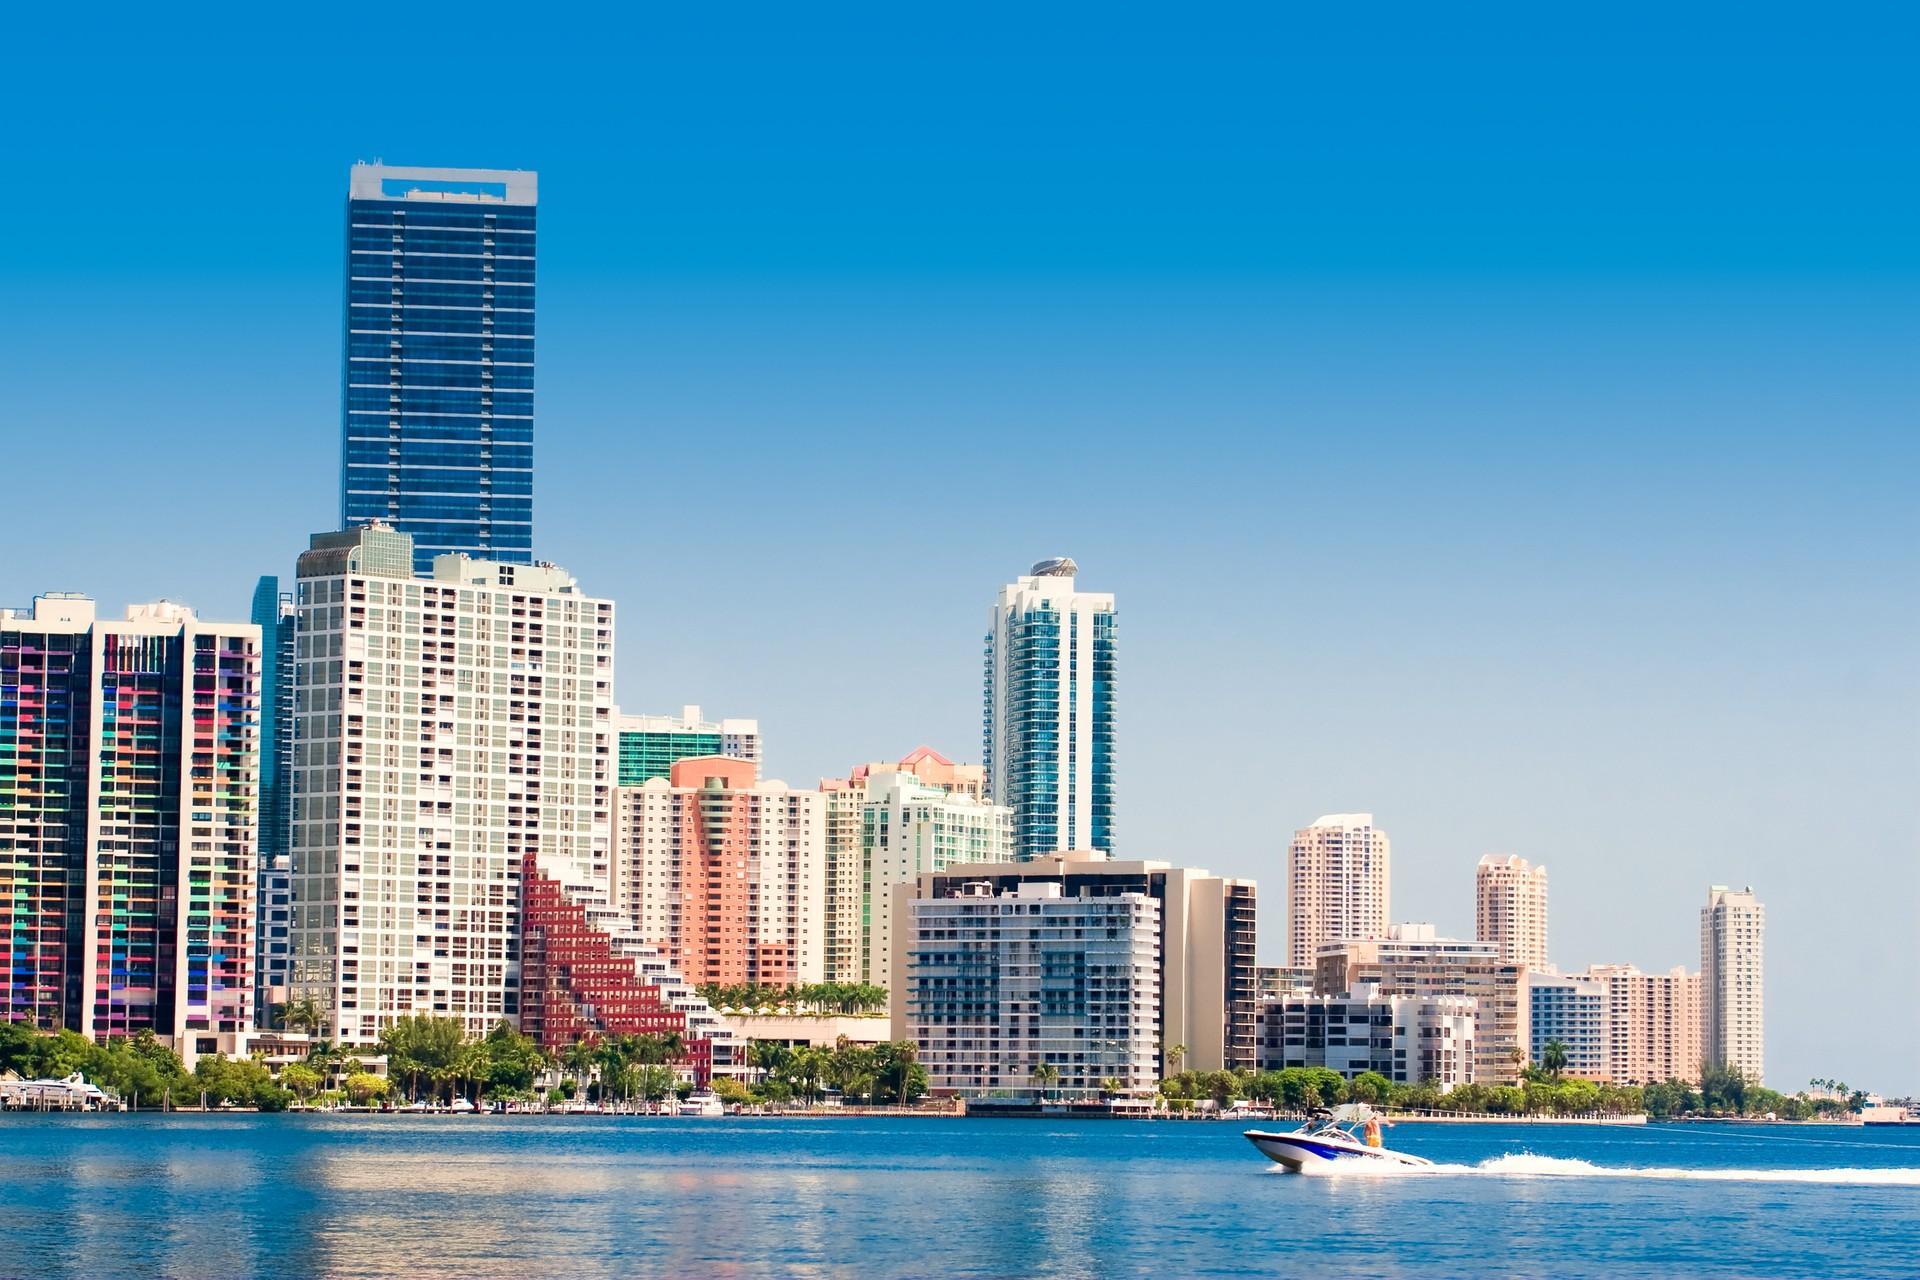 Activités, loisirs et transports Miami - Miami -